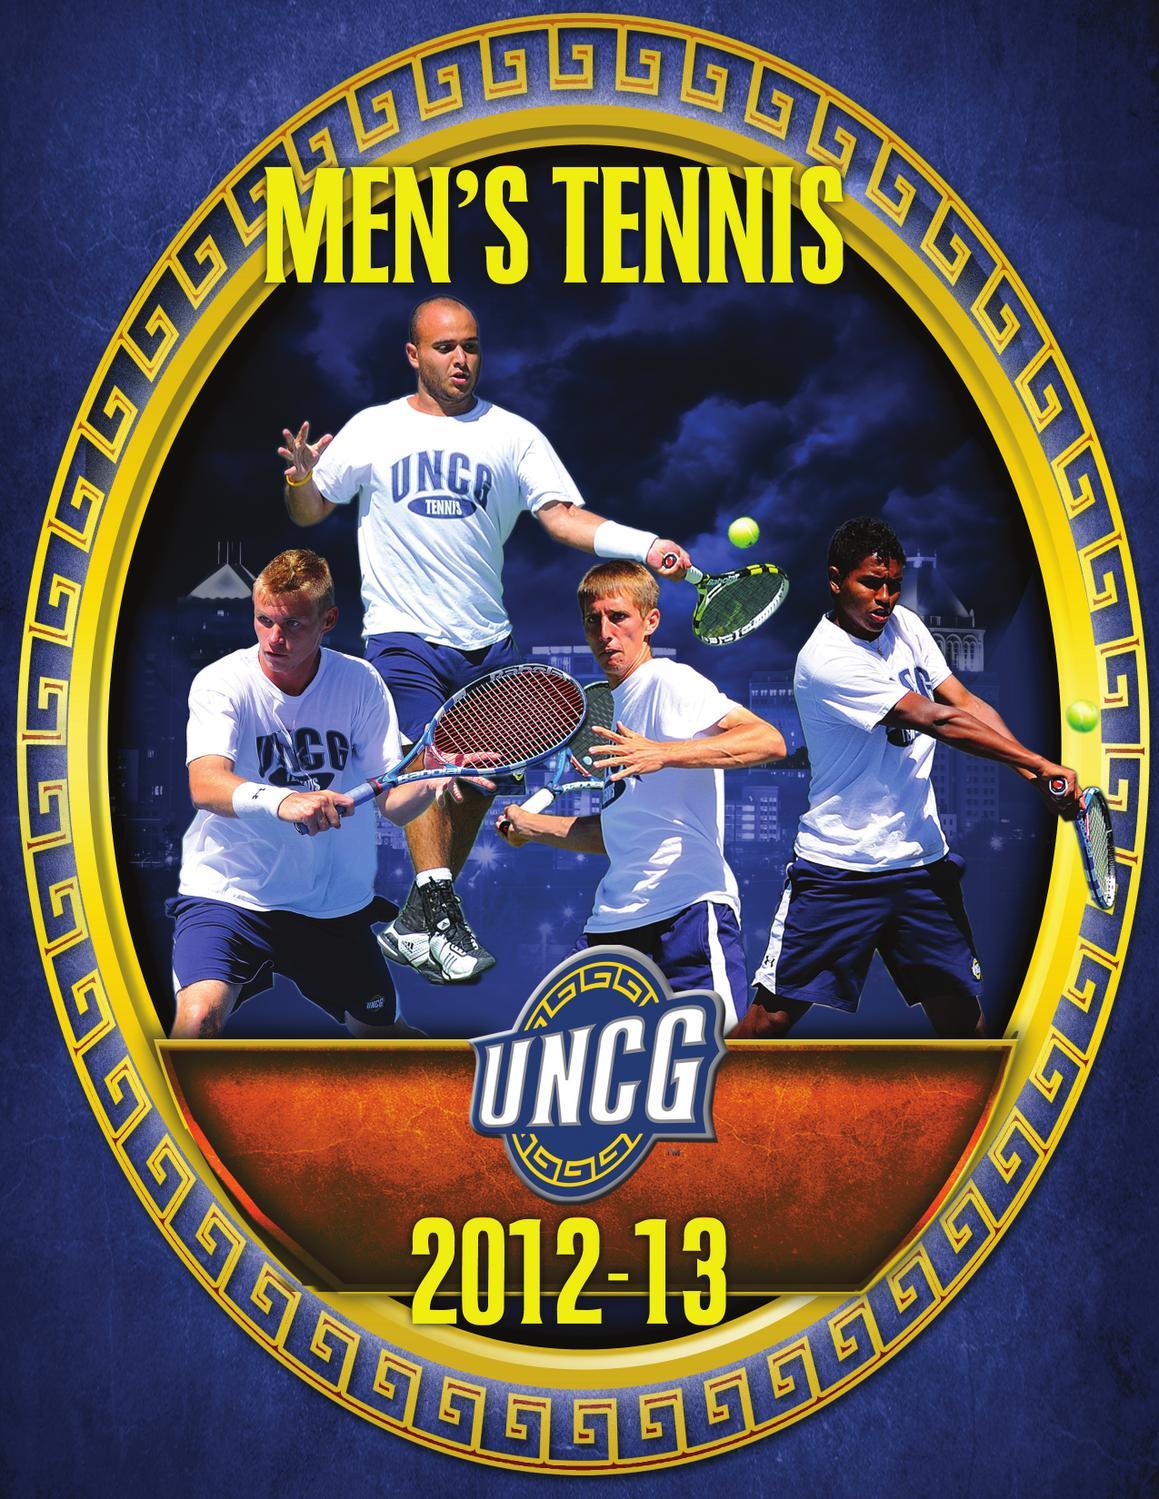 2013 UNCG Volleyball Digital Guide by UNCG Athletics issuu